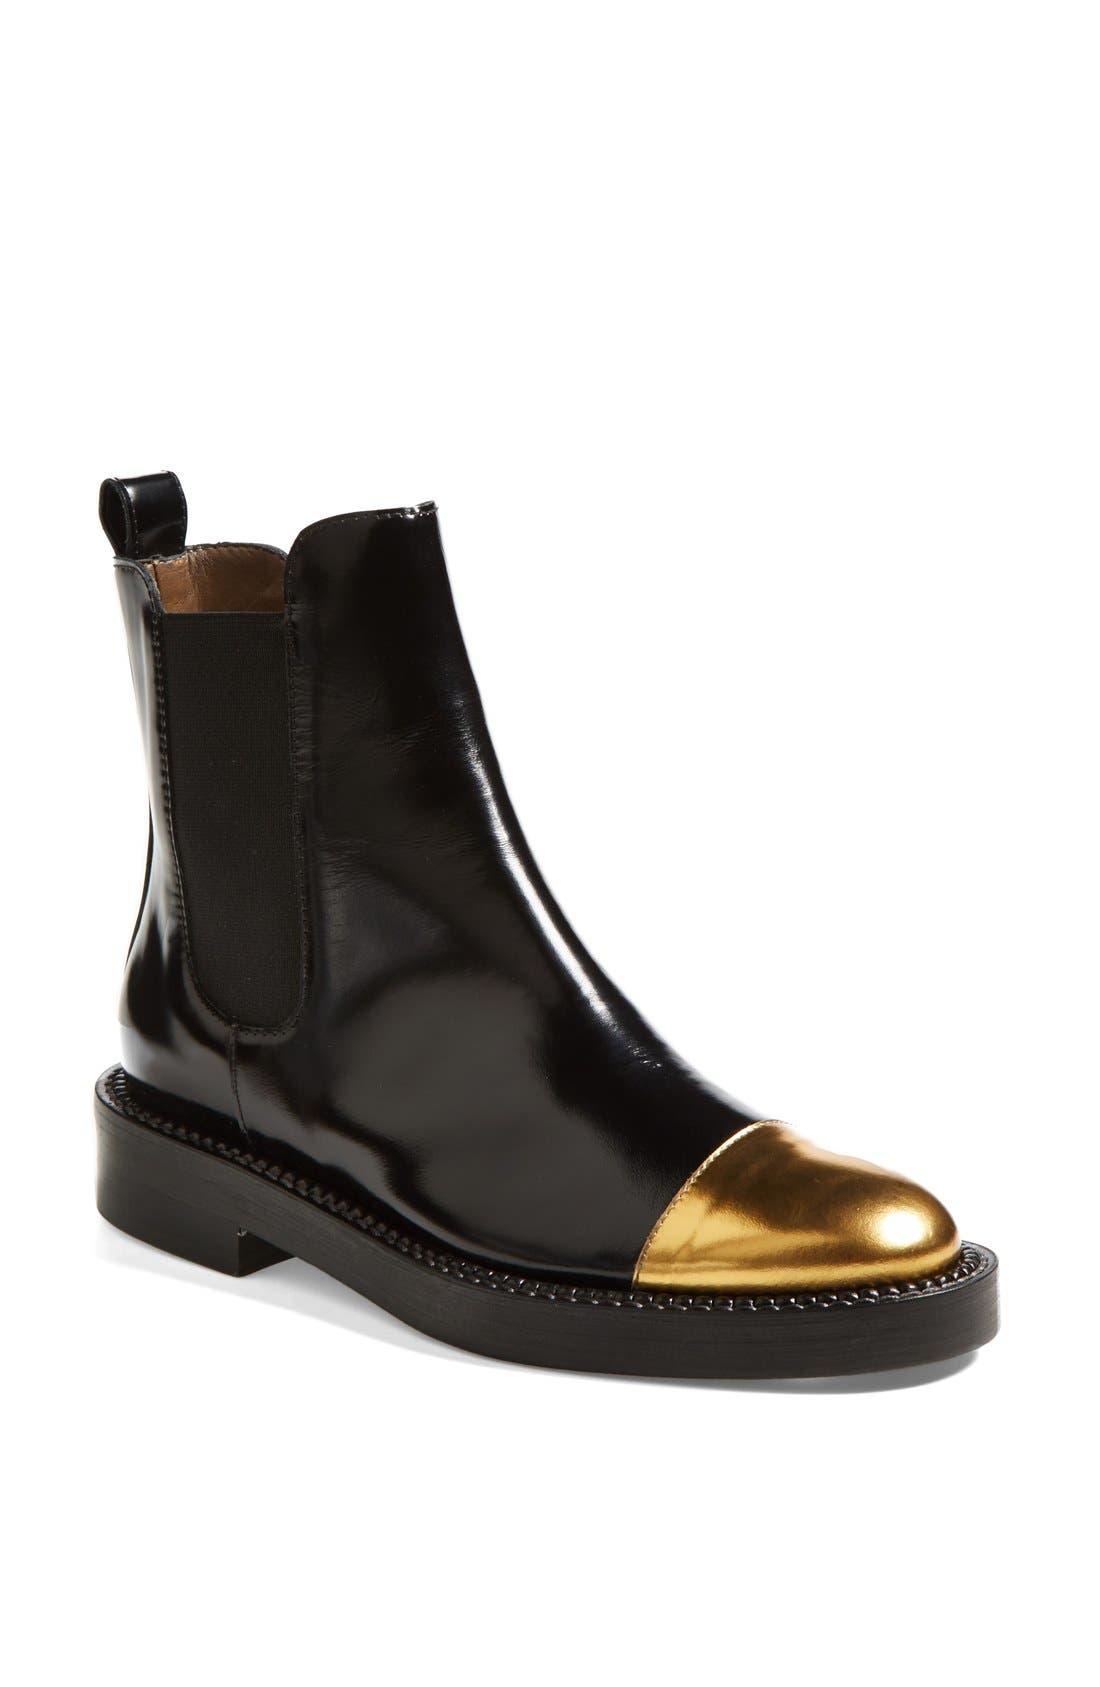 Alternate Image 1 Selected - Marni 'Chelsea' Boot